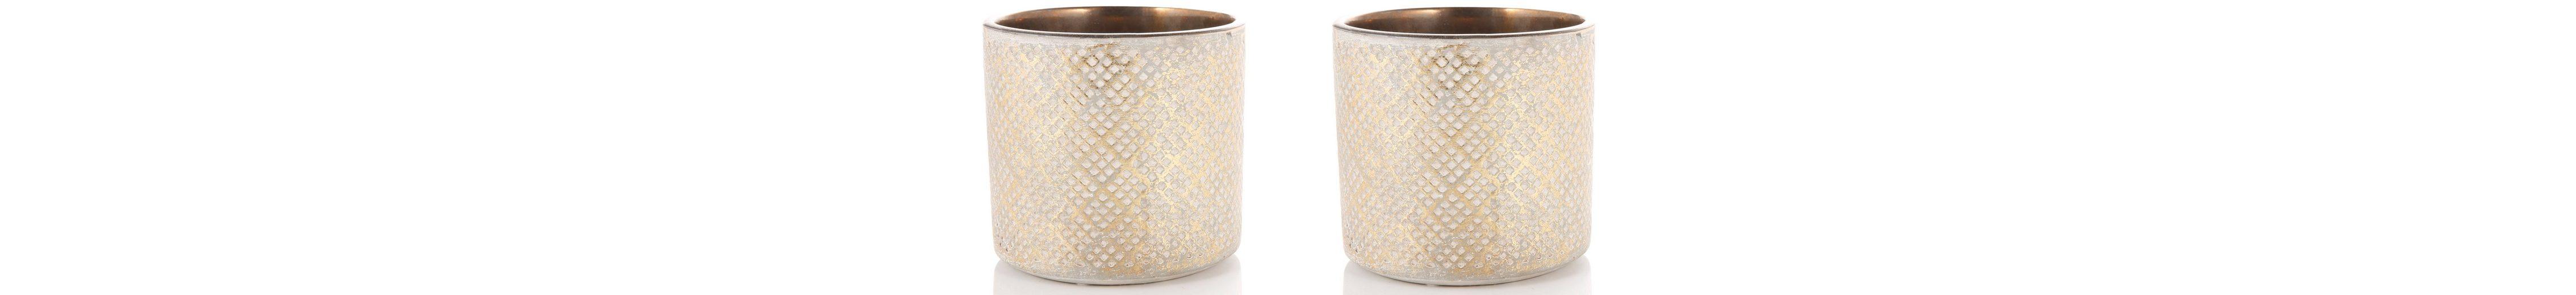 Keramik Übertopf, 2-teilig